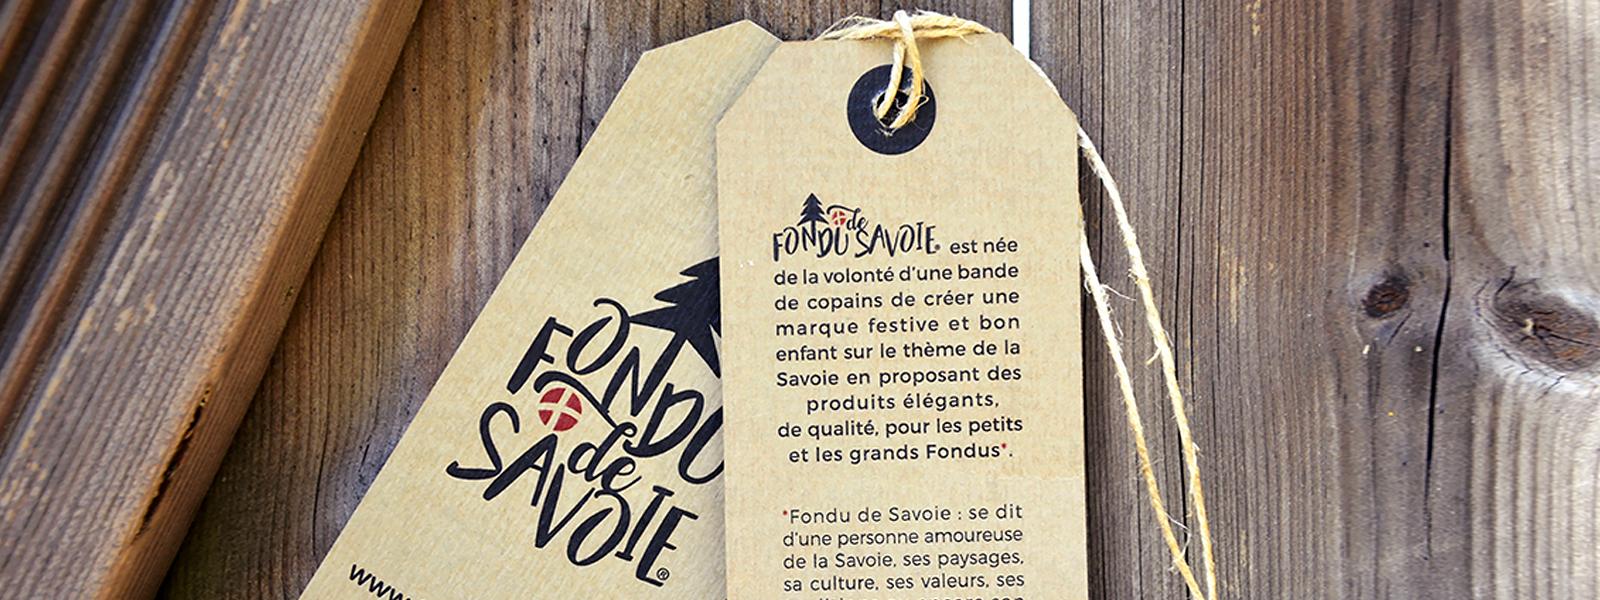 fondue-de-savoie-marque